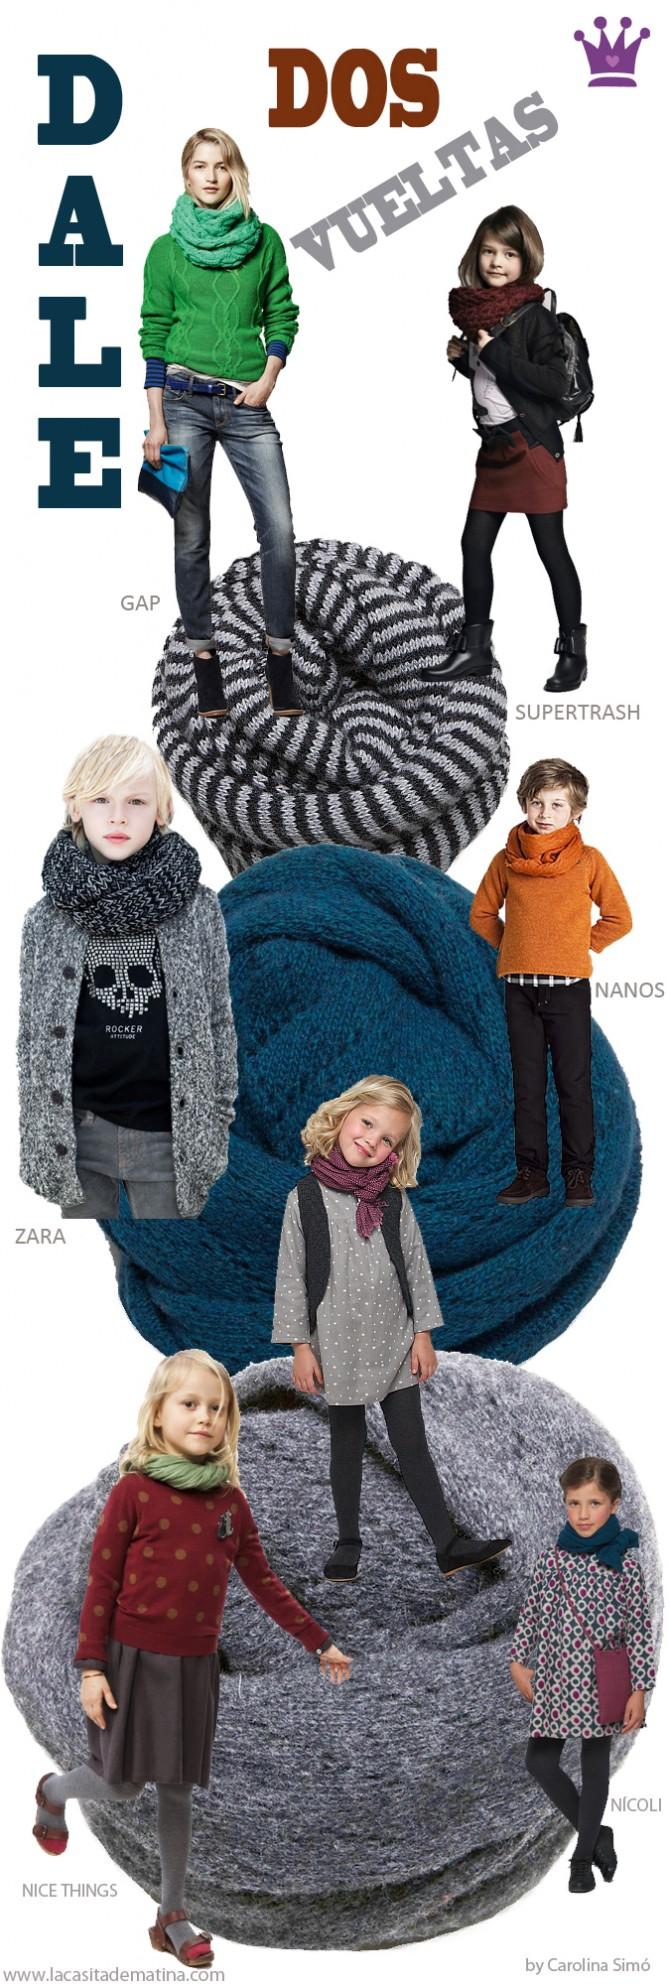 Personal Shopper niños, Tendencias moda infantil, Blog Moda Infantil, Ropa vestir niños, Zara, Gap, Nice Things, Nícoli